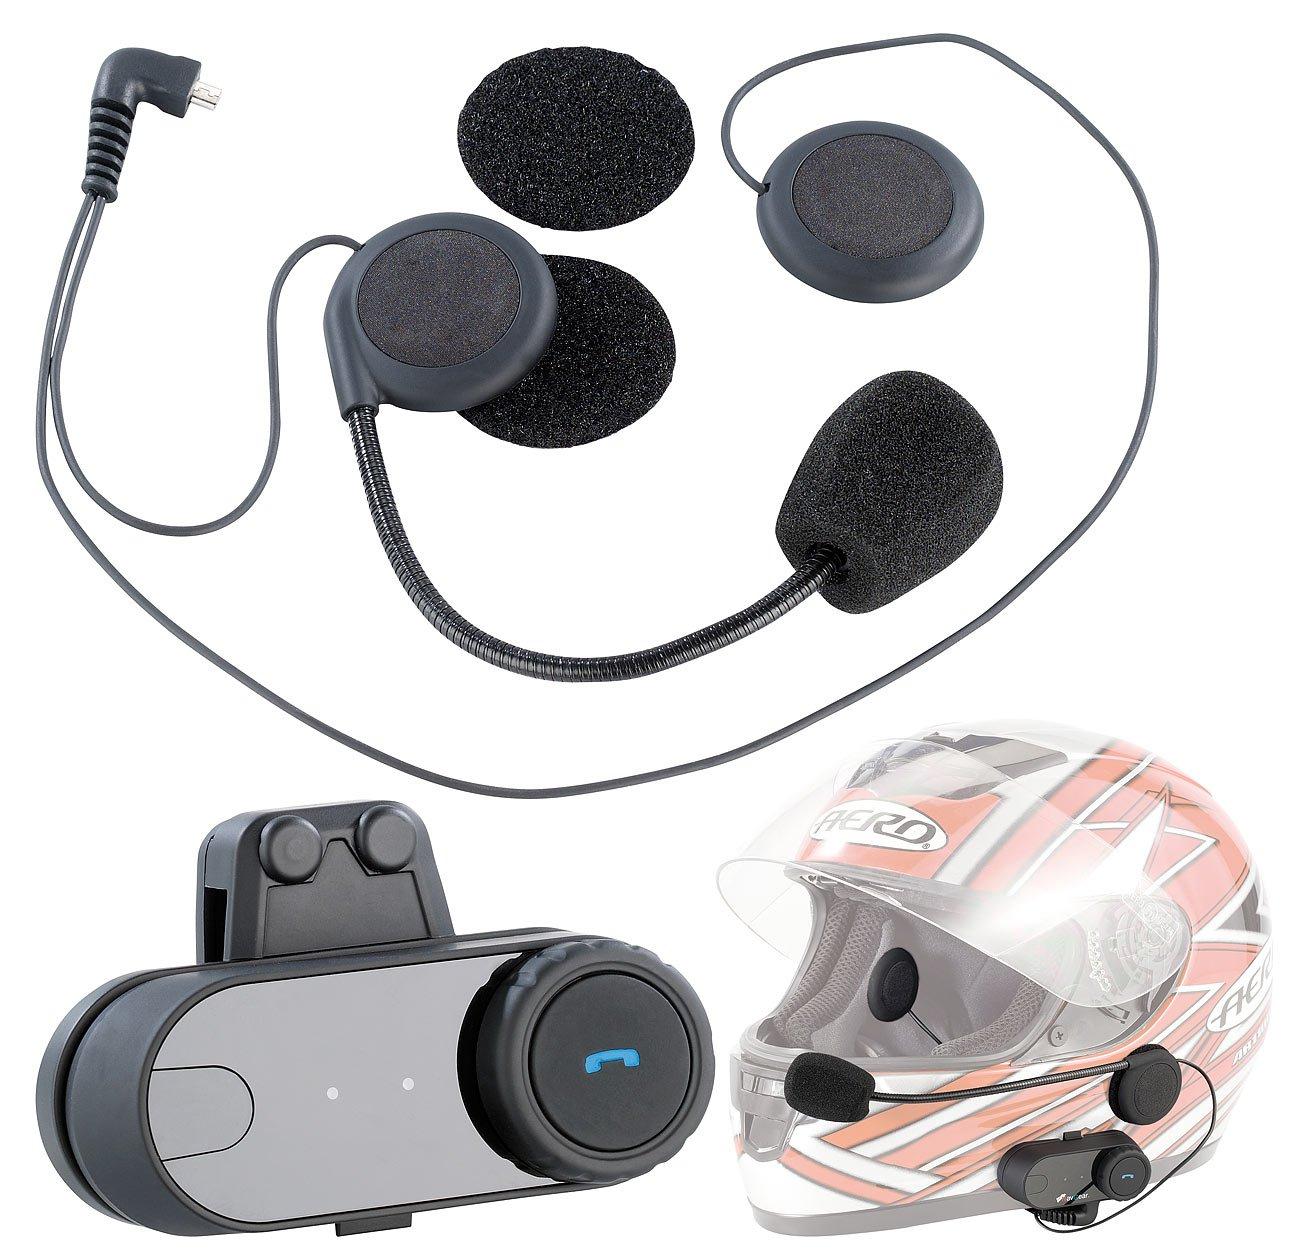 NavGear Headset Motorrad: Universal Headset für: Amazon.de: Elektronik